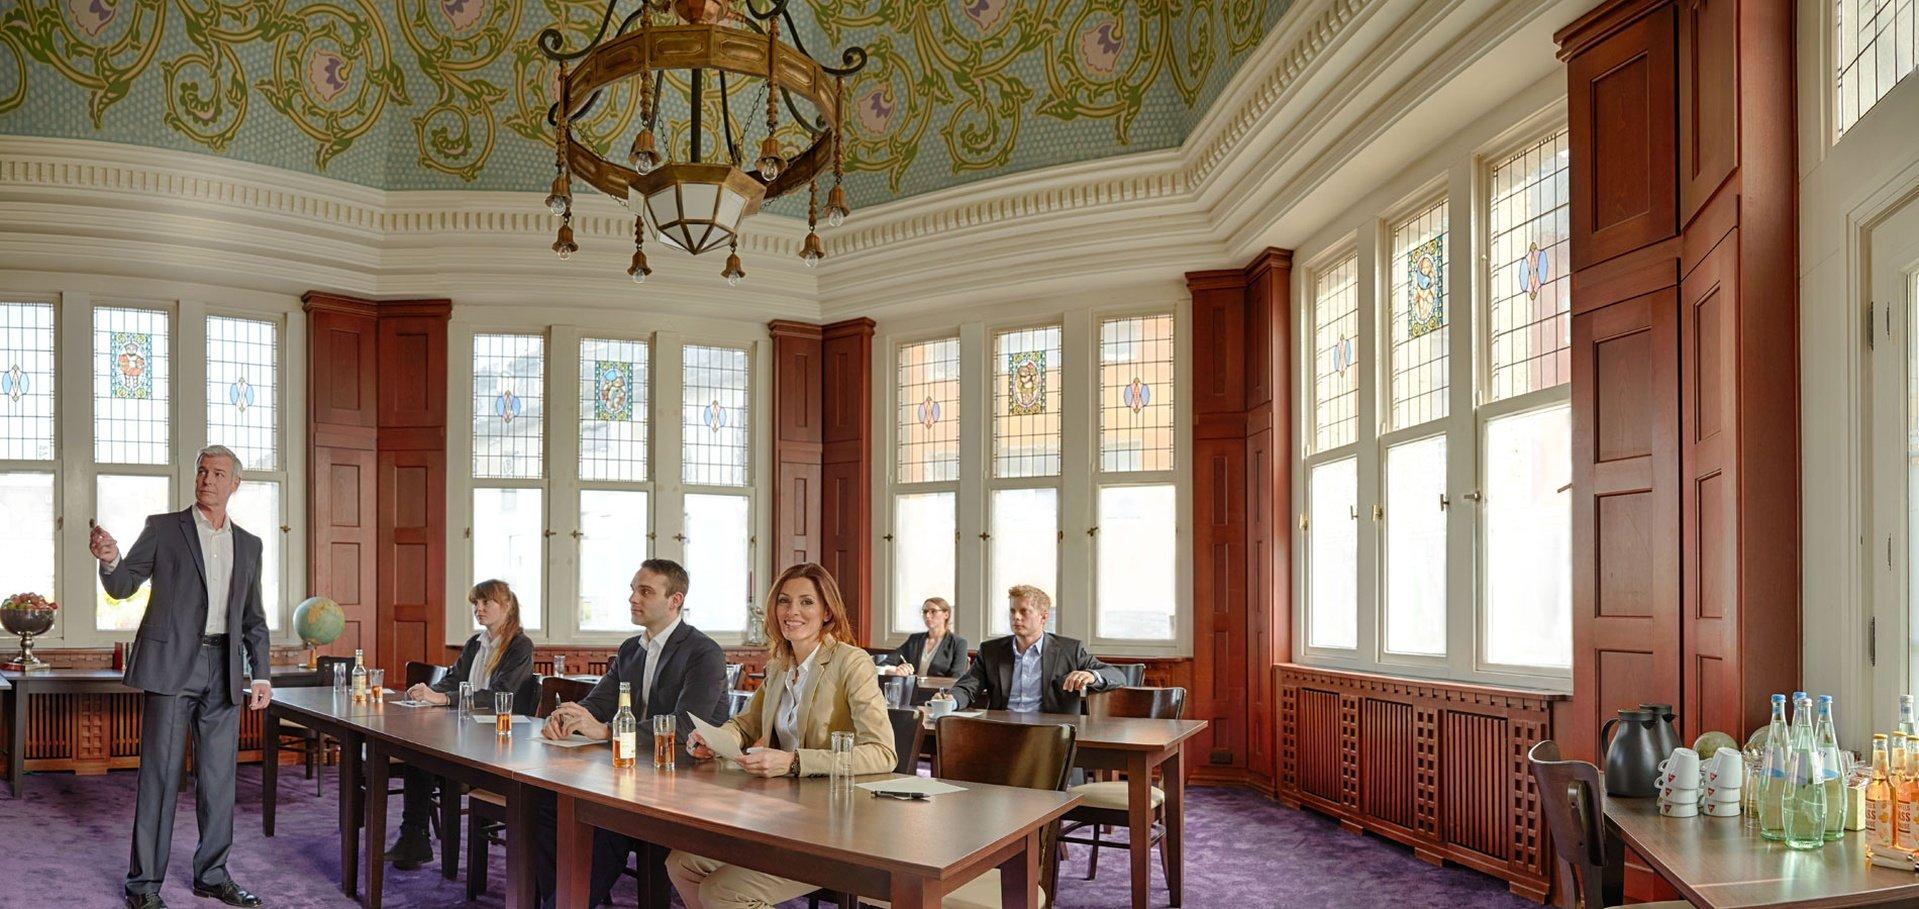 Cologne seminar rooms Salle de réunion Kuppelsaal Neptunbad image 0